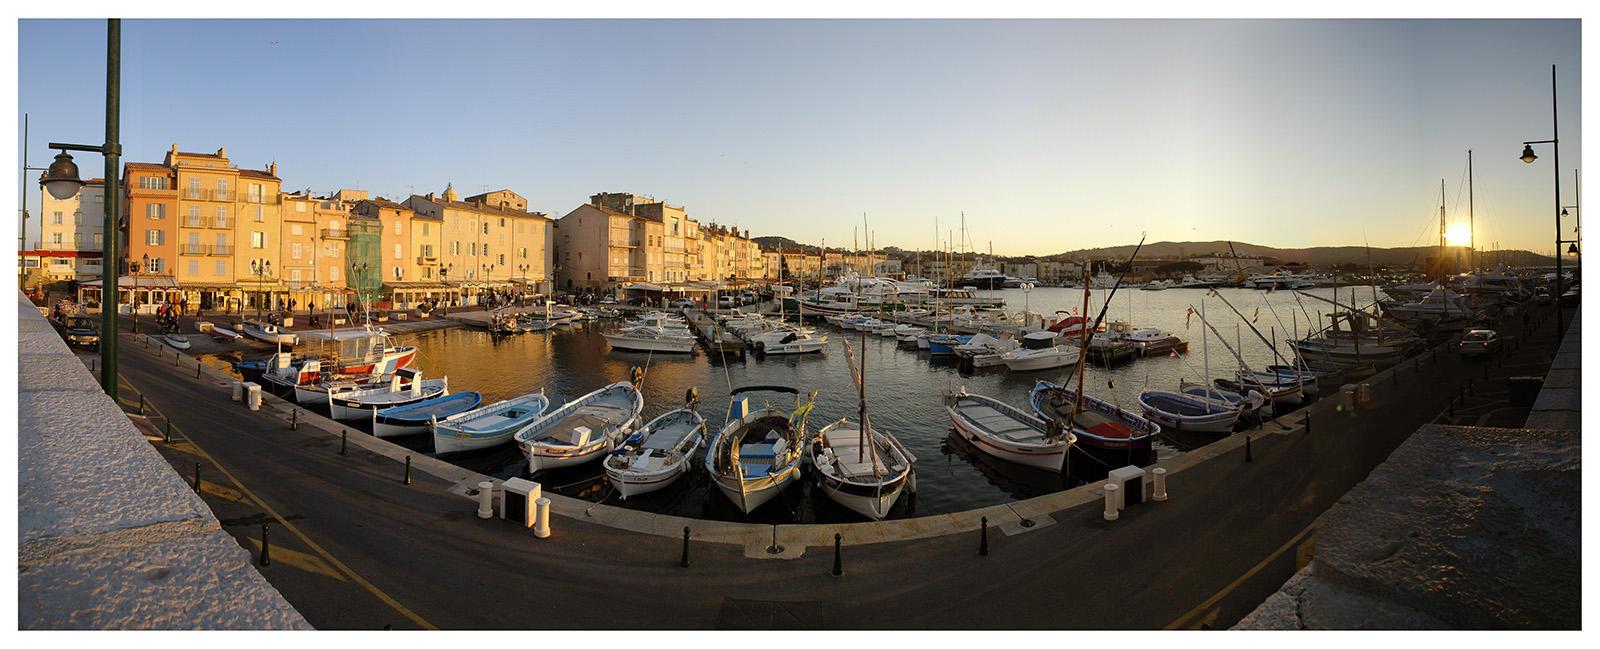 St Tropez by manuamador